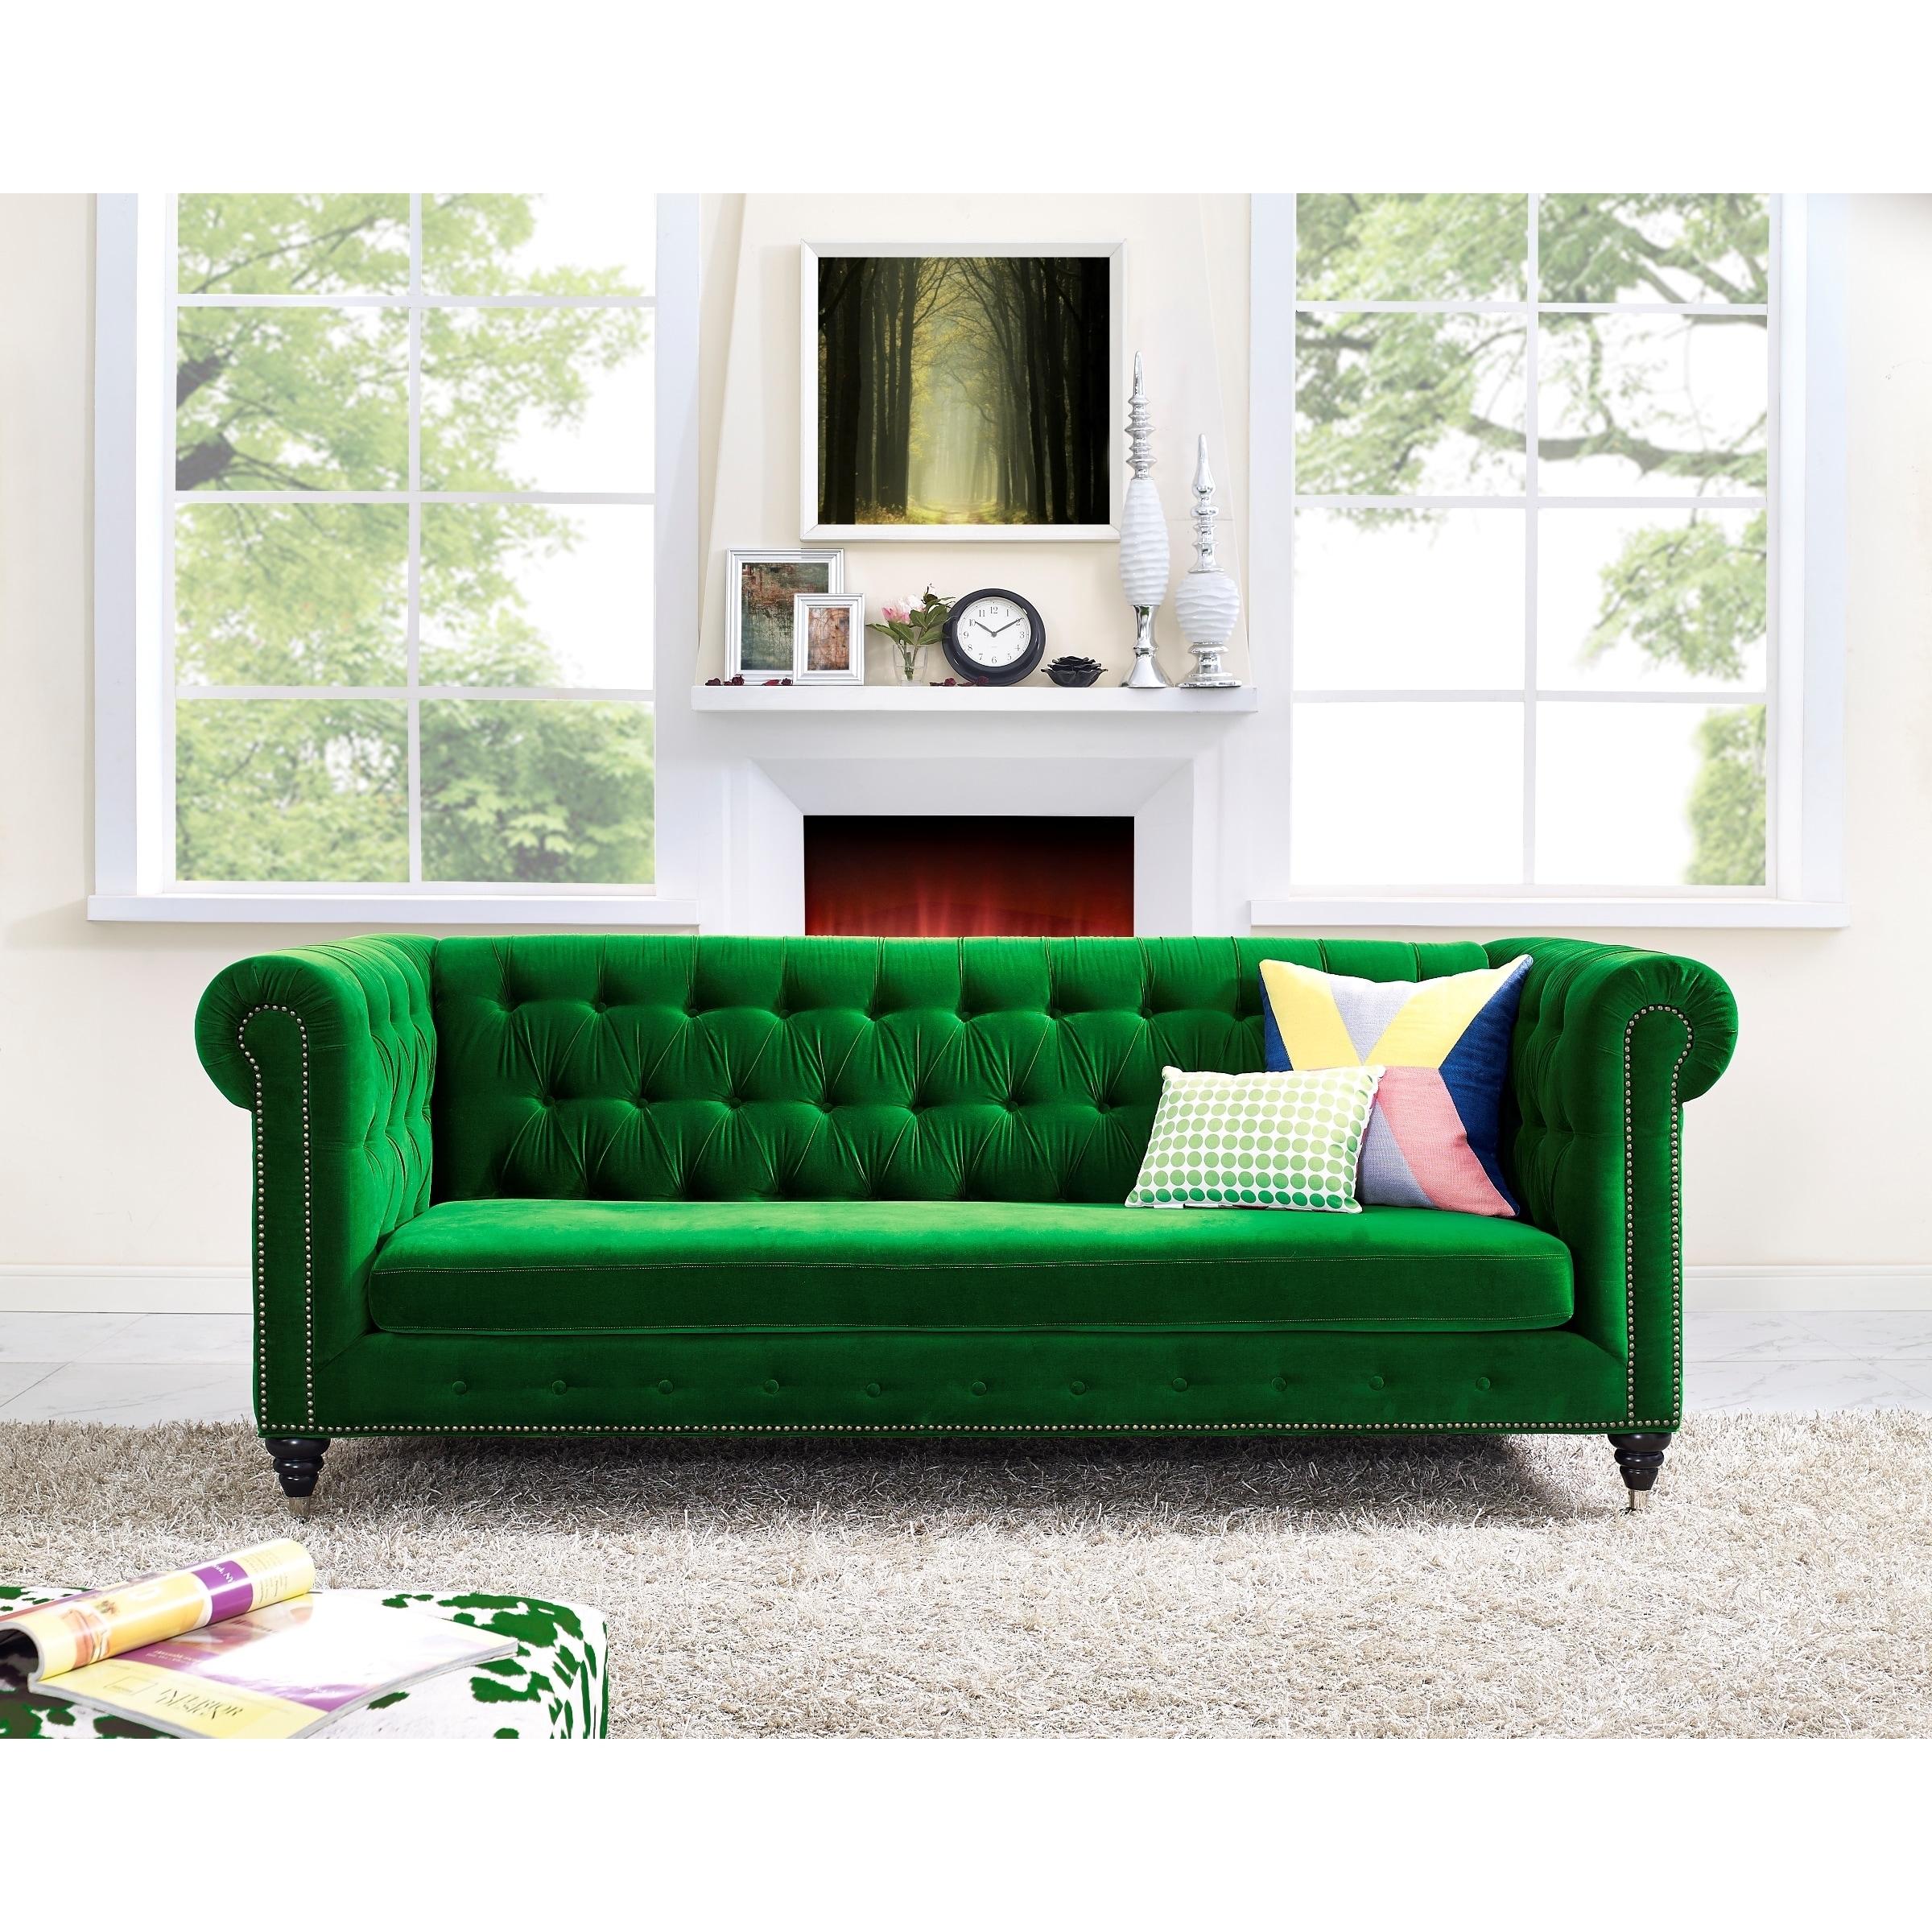 Emerald Green Velvet Sofa : Sofa Design - Decorate Around A Green ...